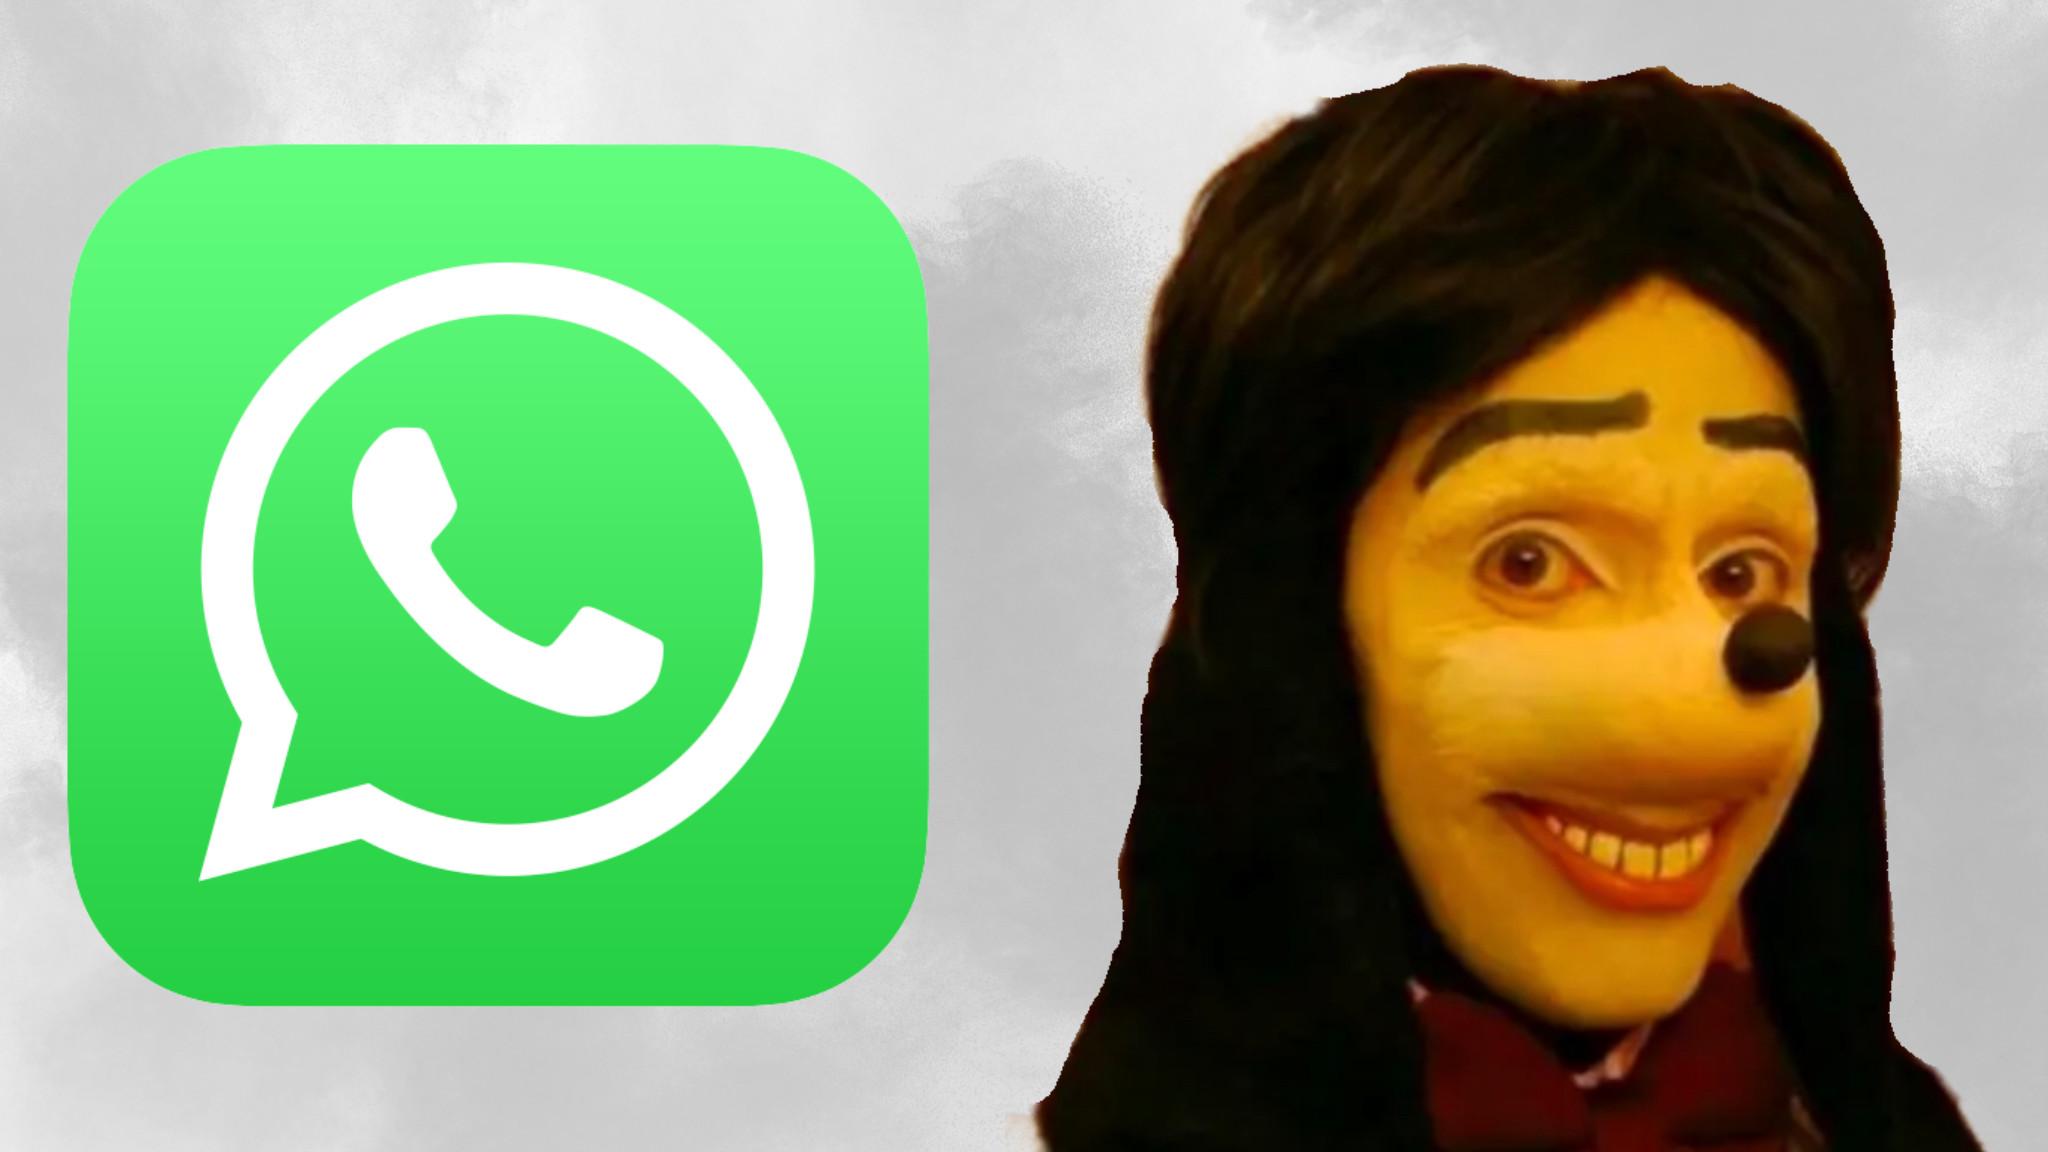 Goofy Whatsapp